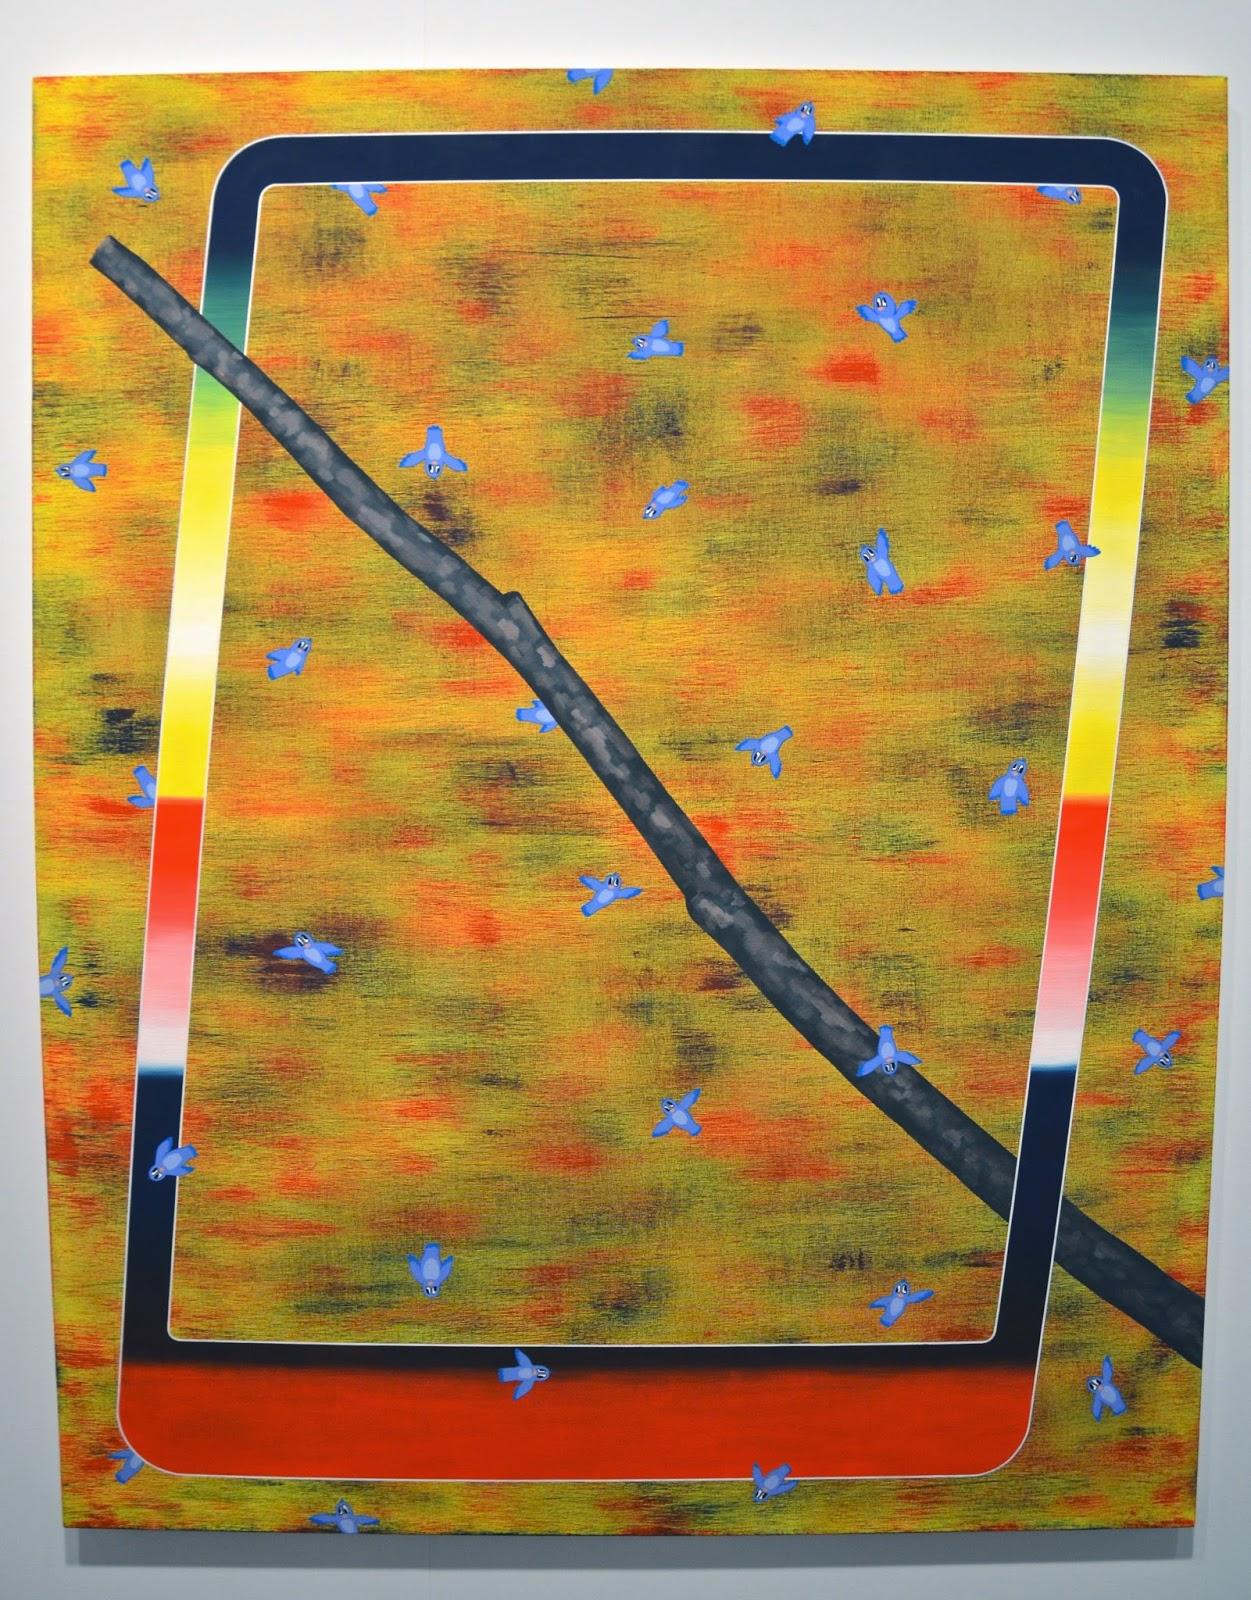 Henry Gunderson Swarm Behavior 2014 Flashe And Acrylic